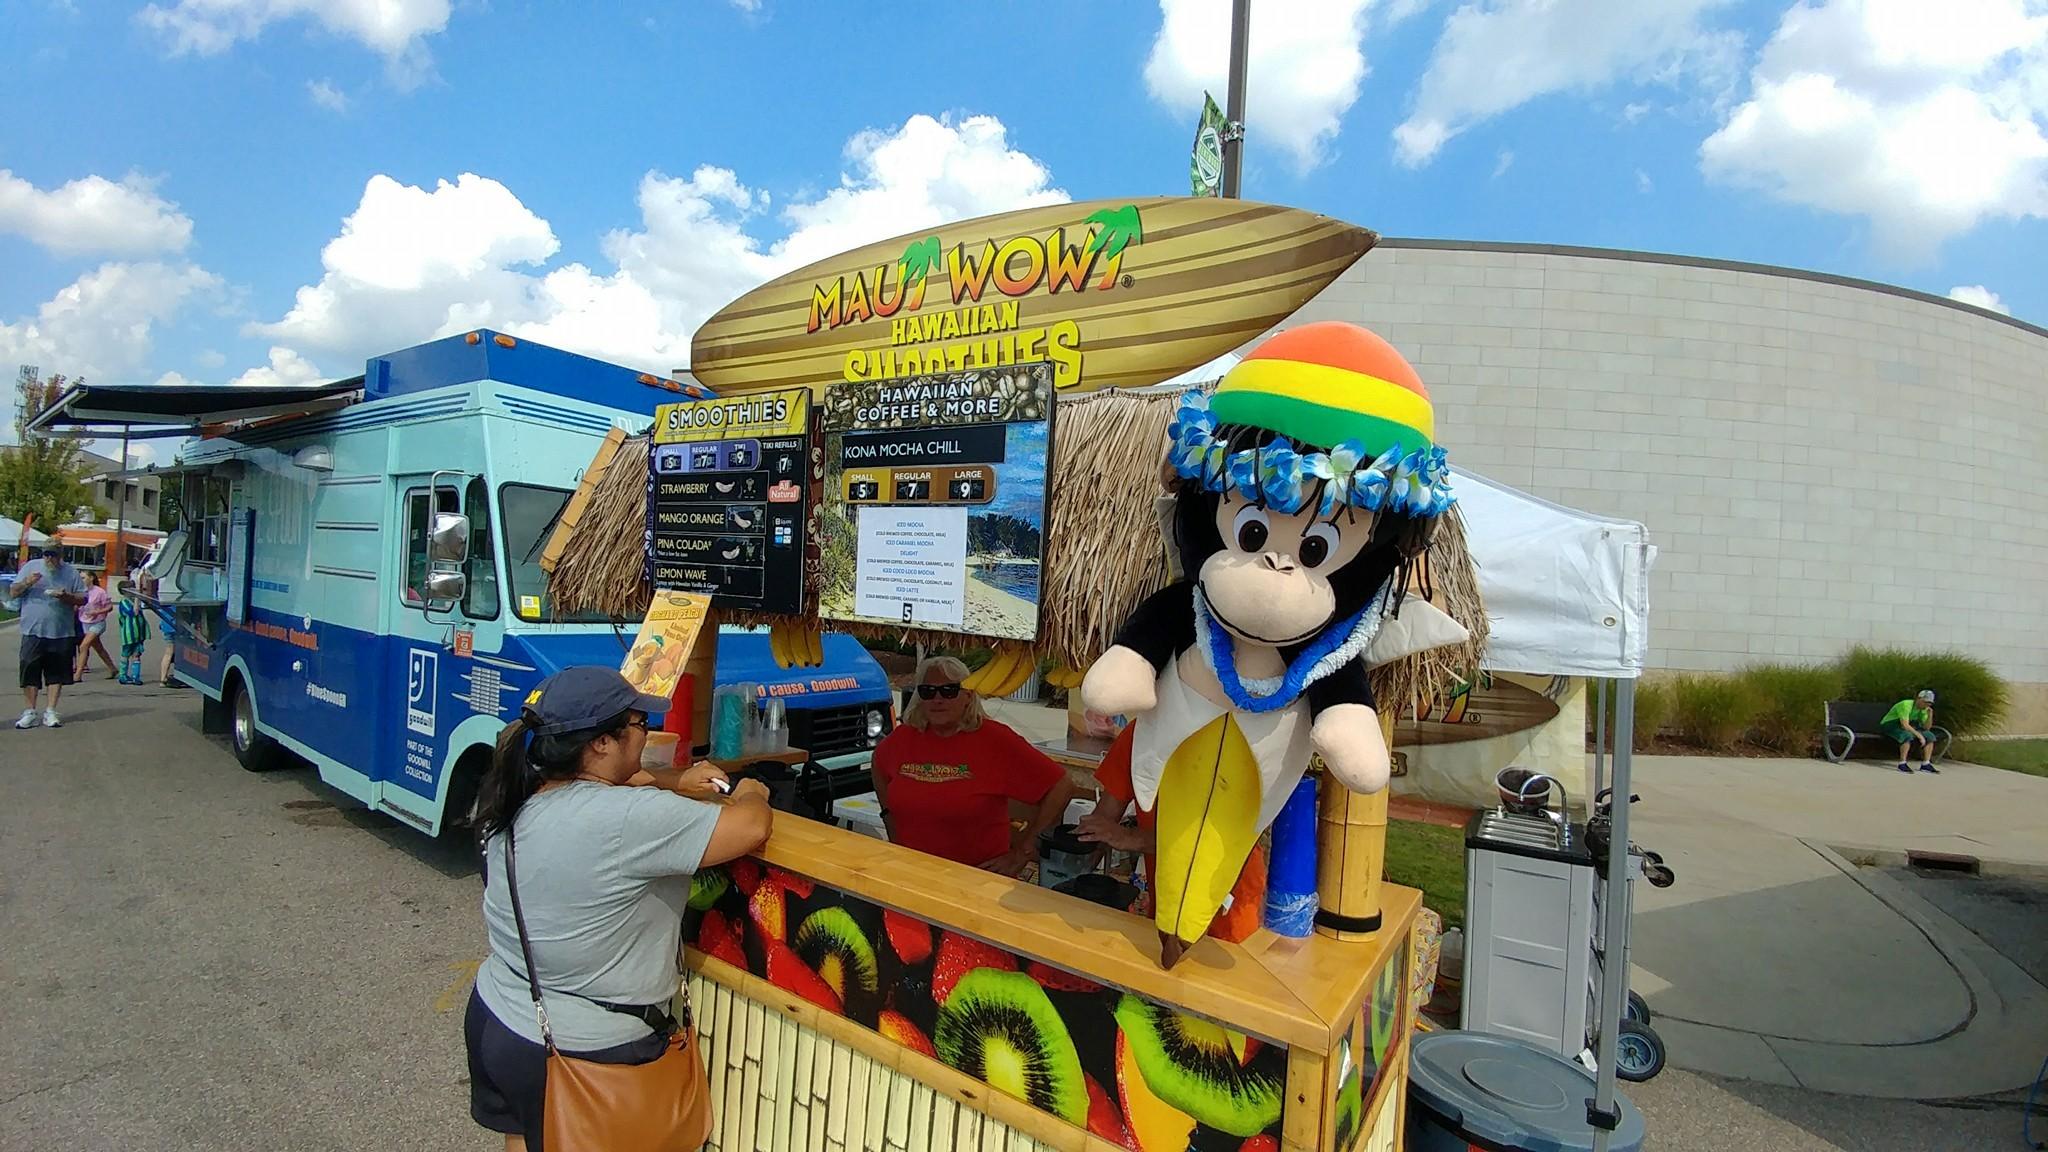 City of Kentwood, Michigan Maui Wow Food Truck